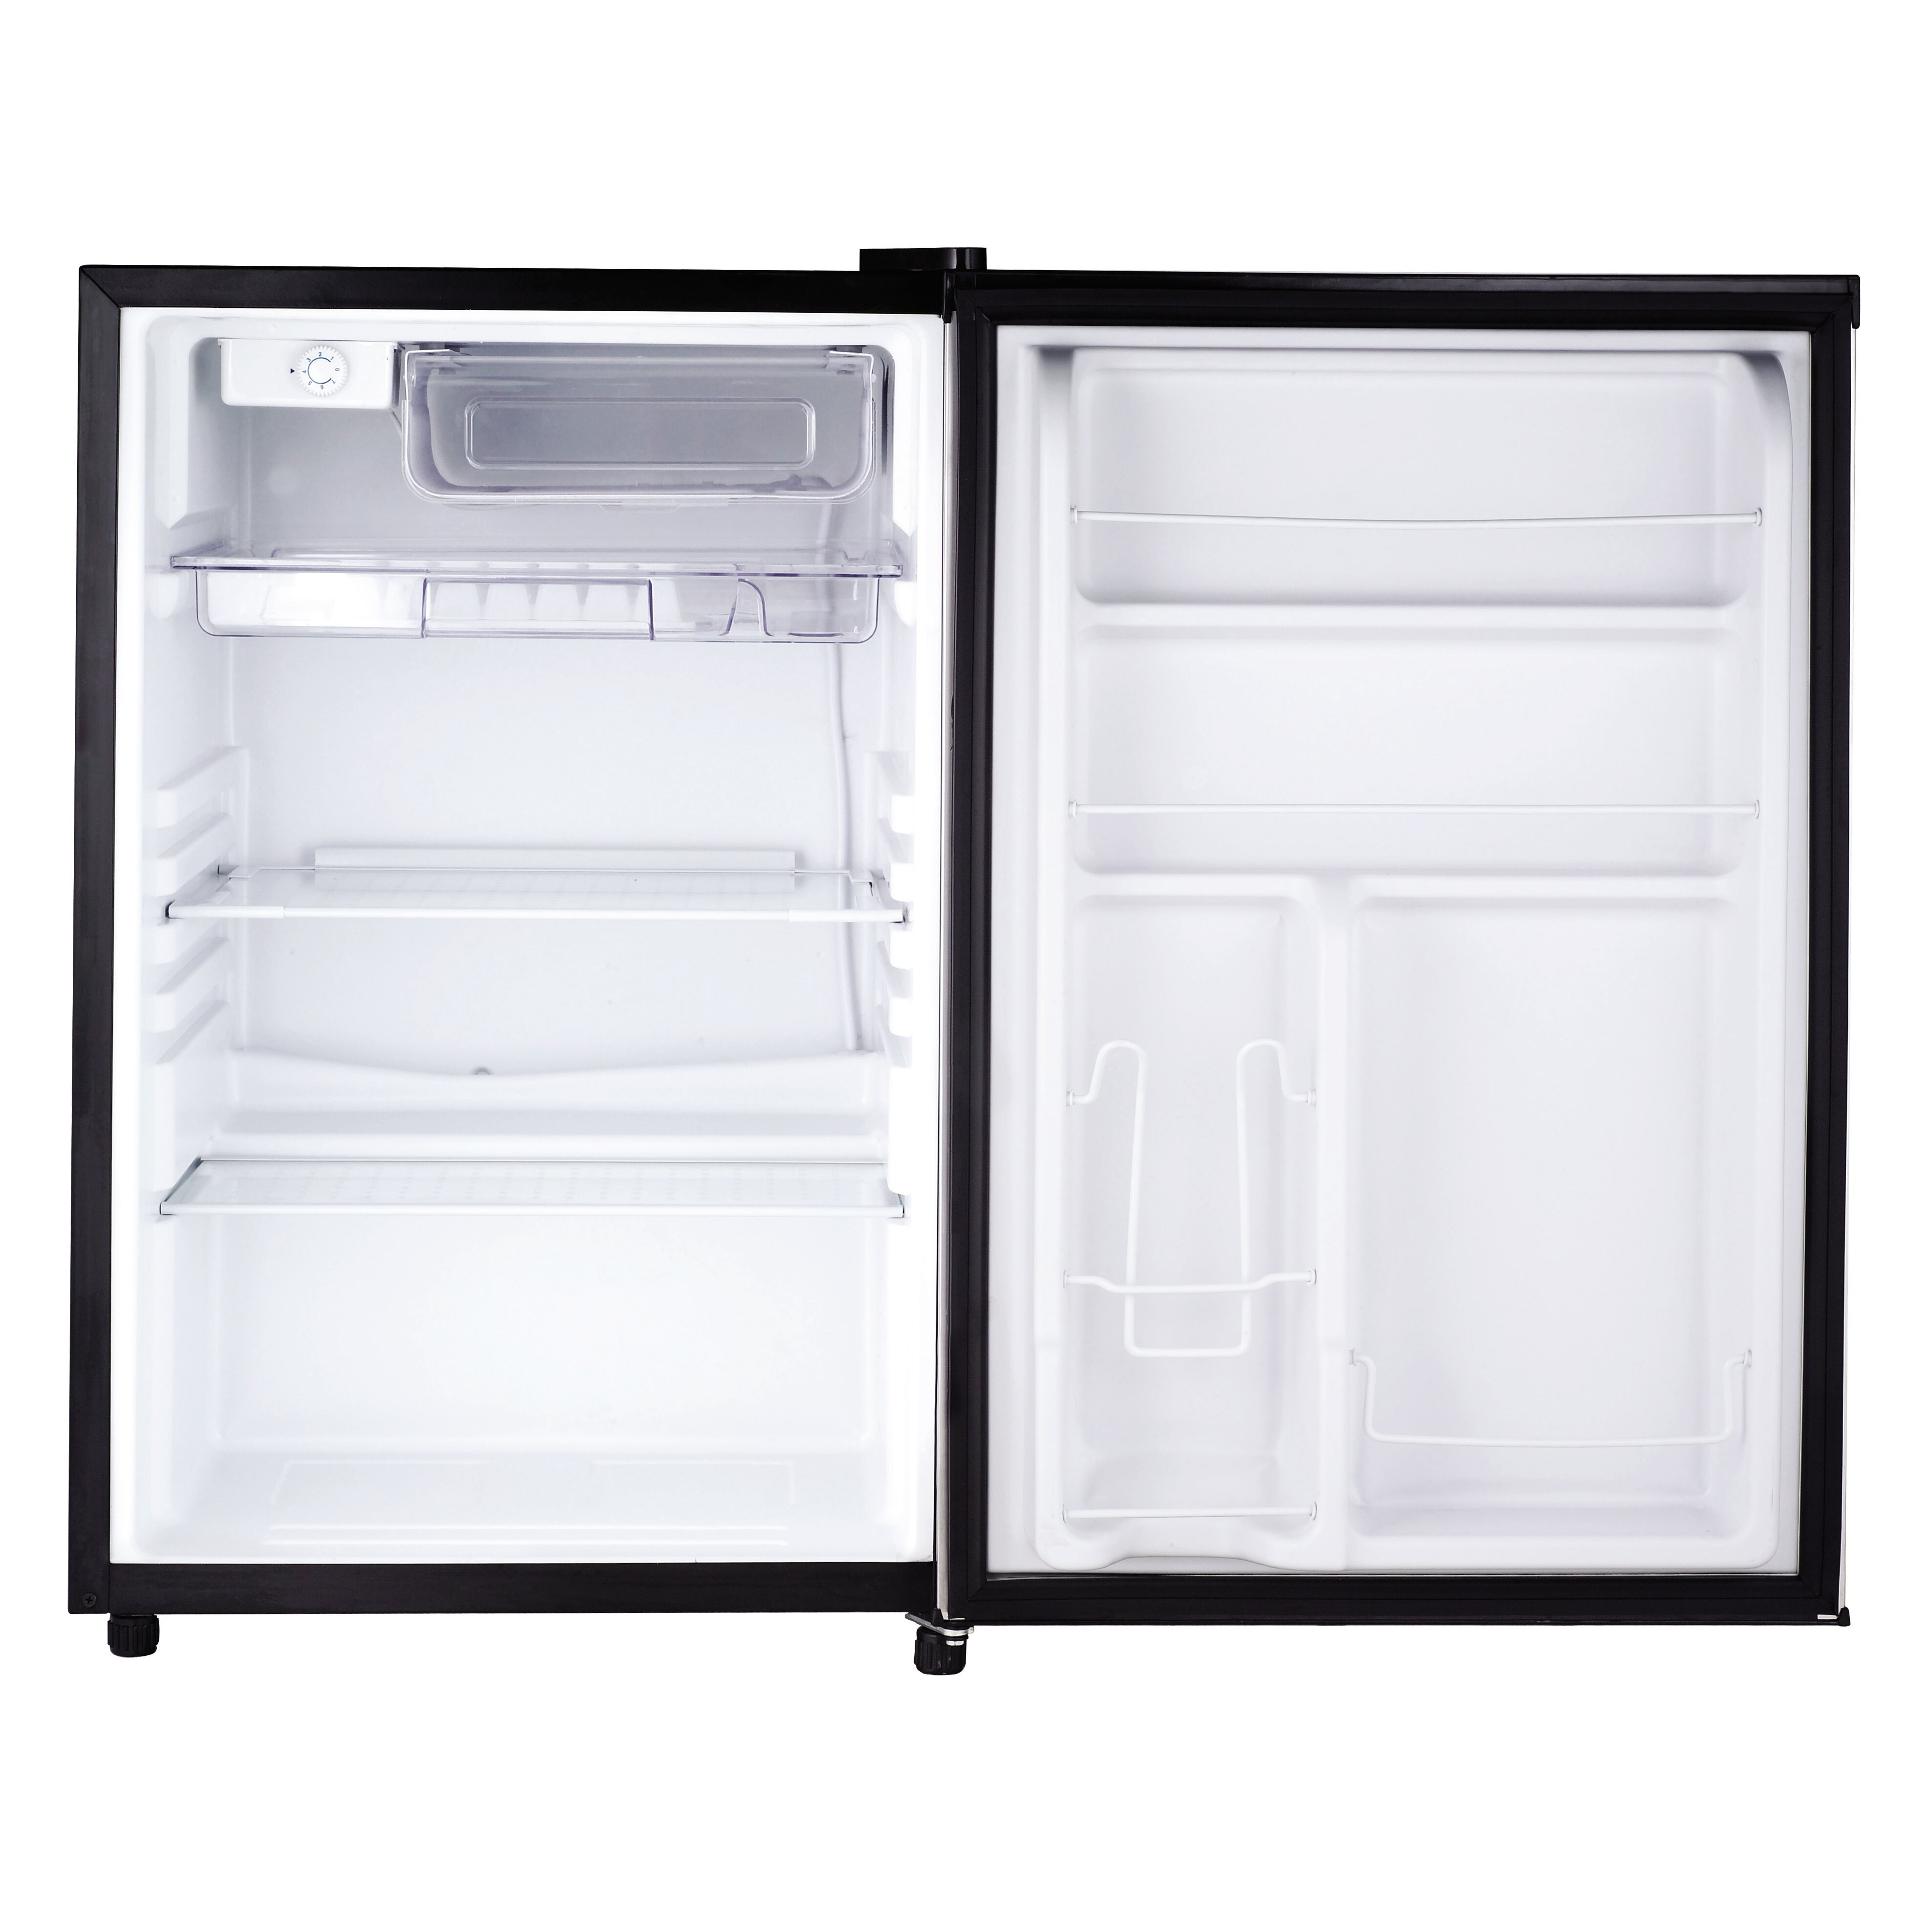 Bed furniture top view - Remodel Appliances Compact Refrigerators Igloo Part Fr465 Sku